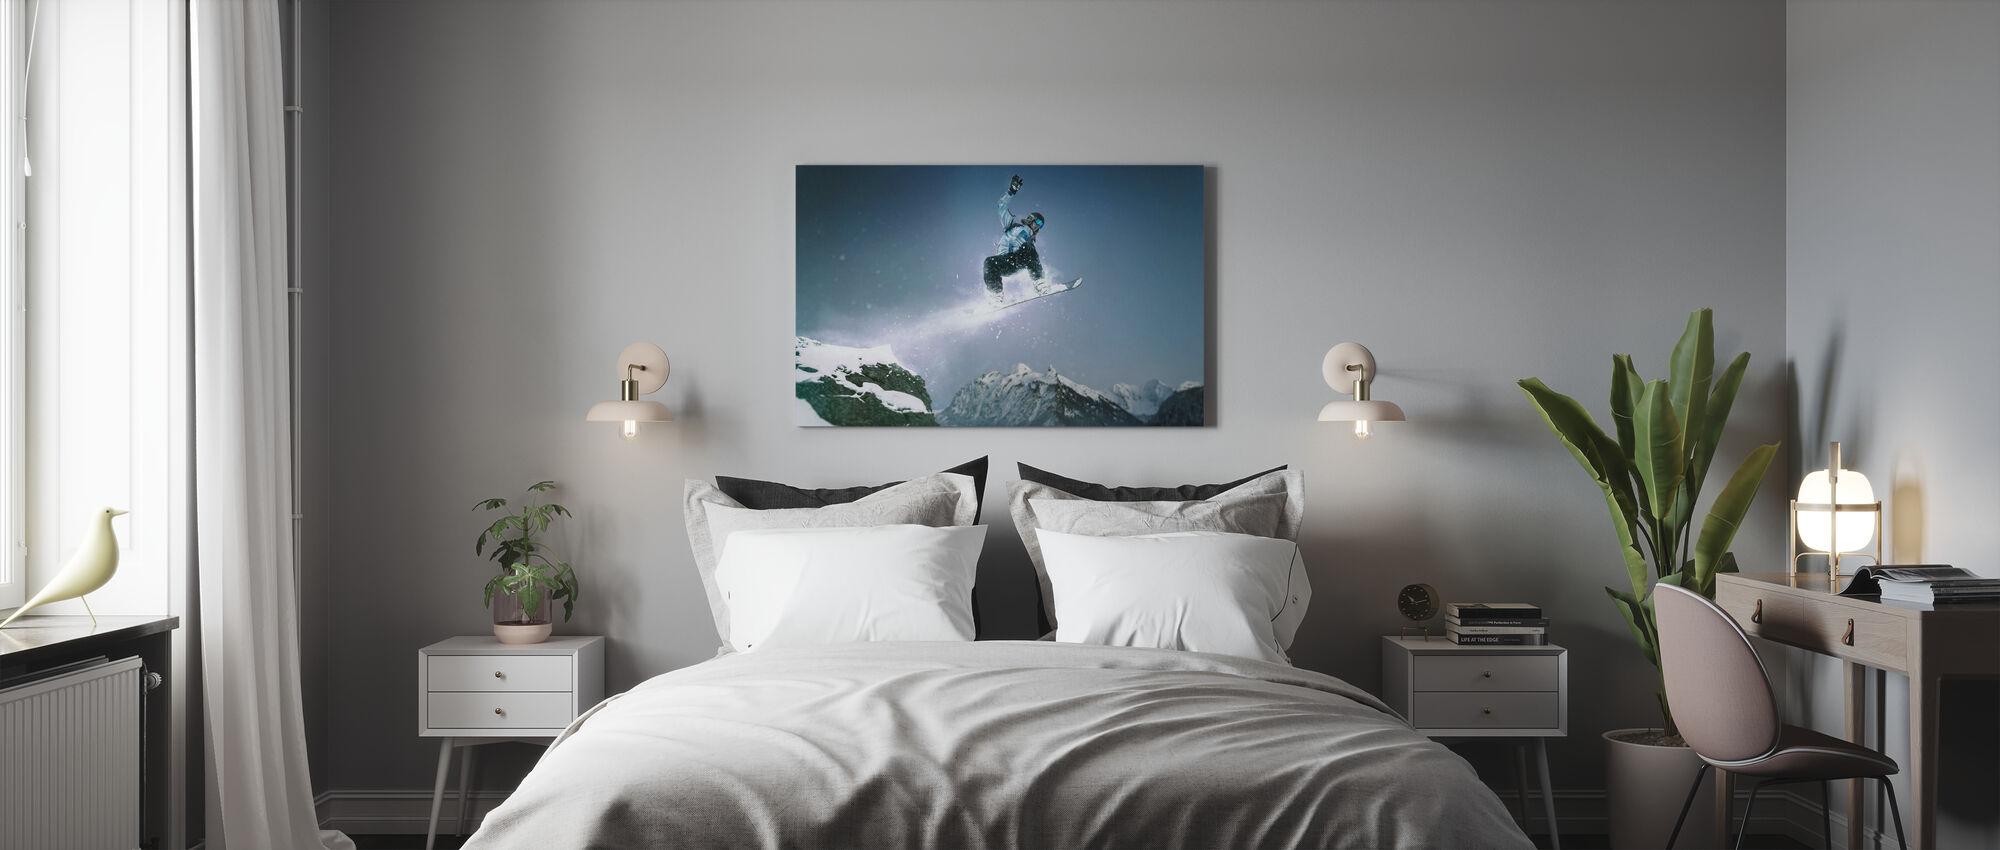 Snowboard Method Grab - Canvas print - Bedroom